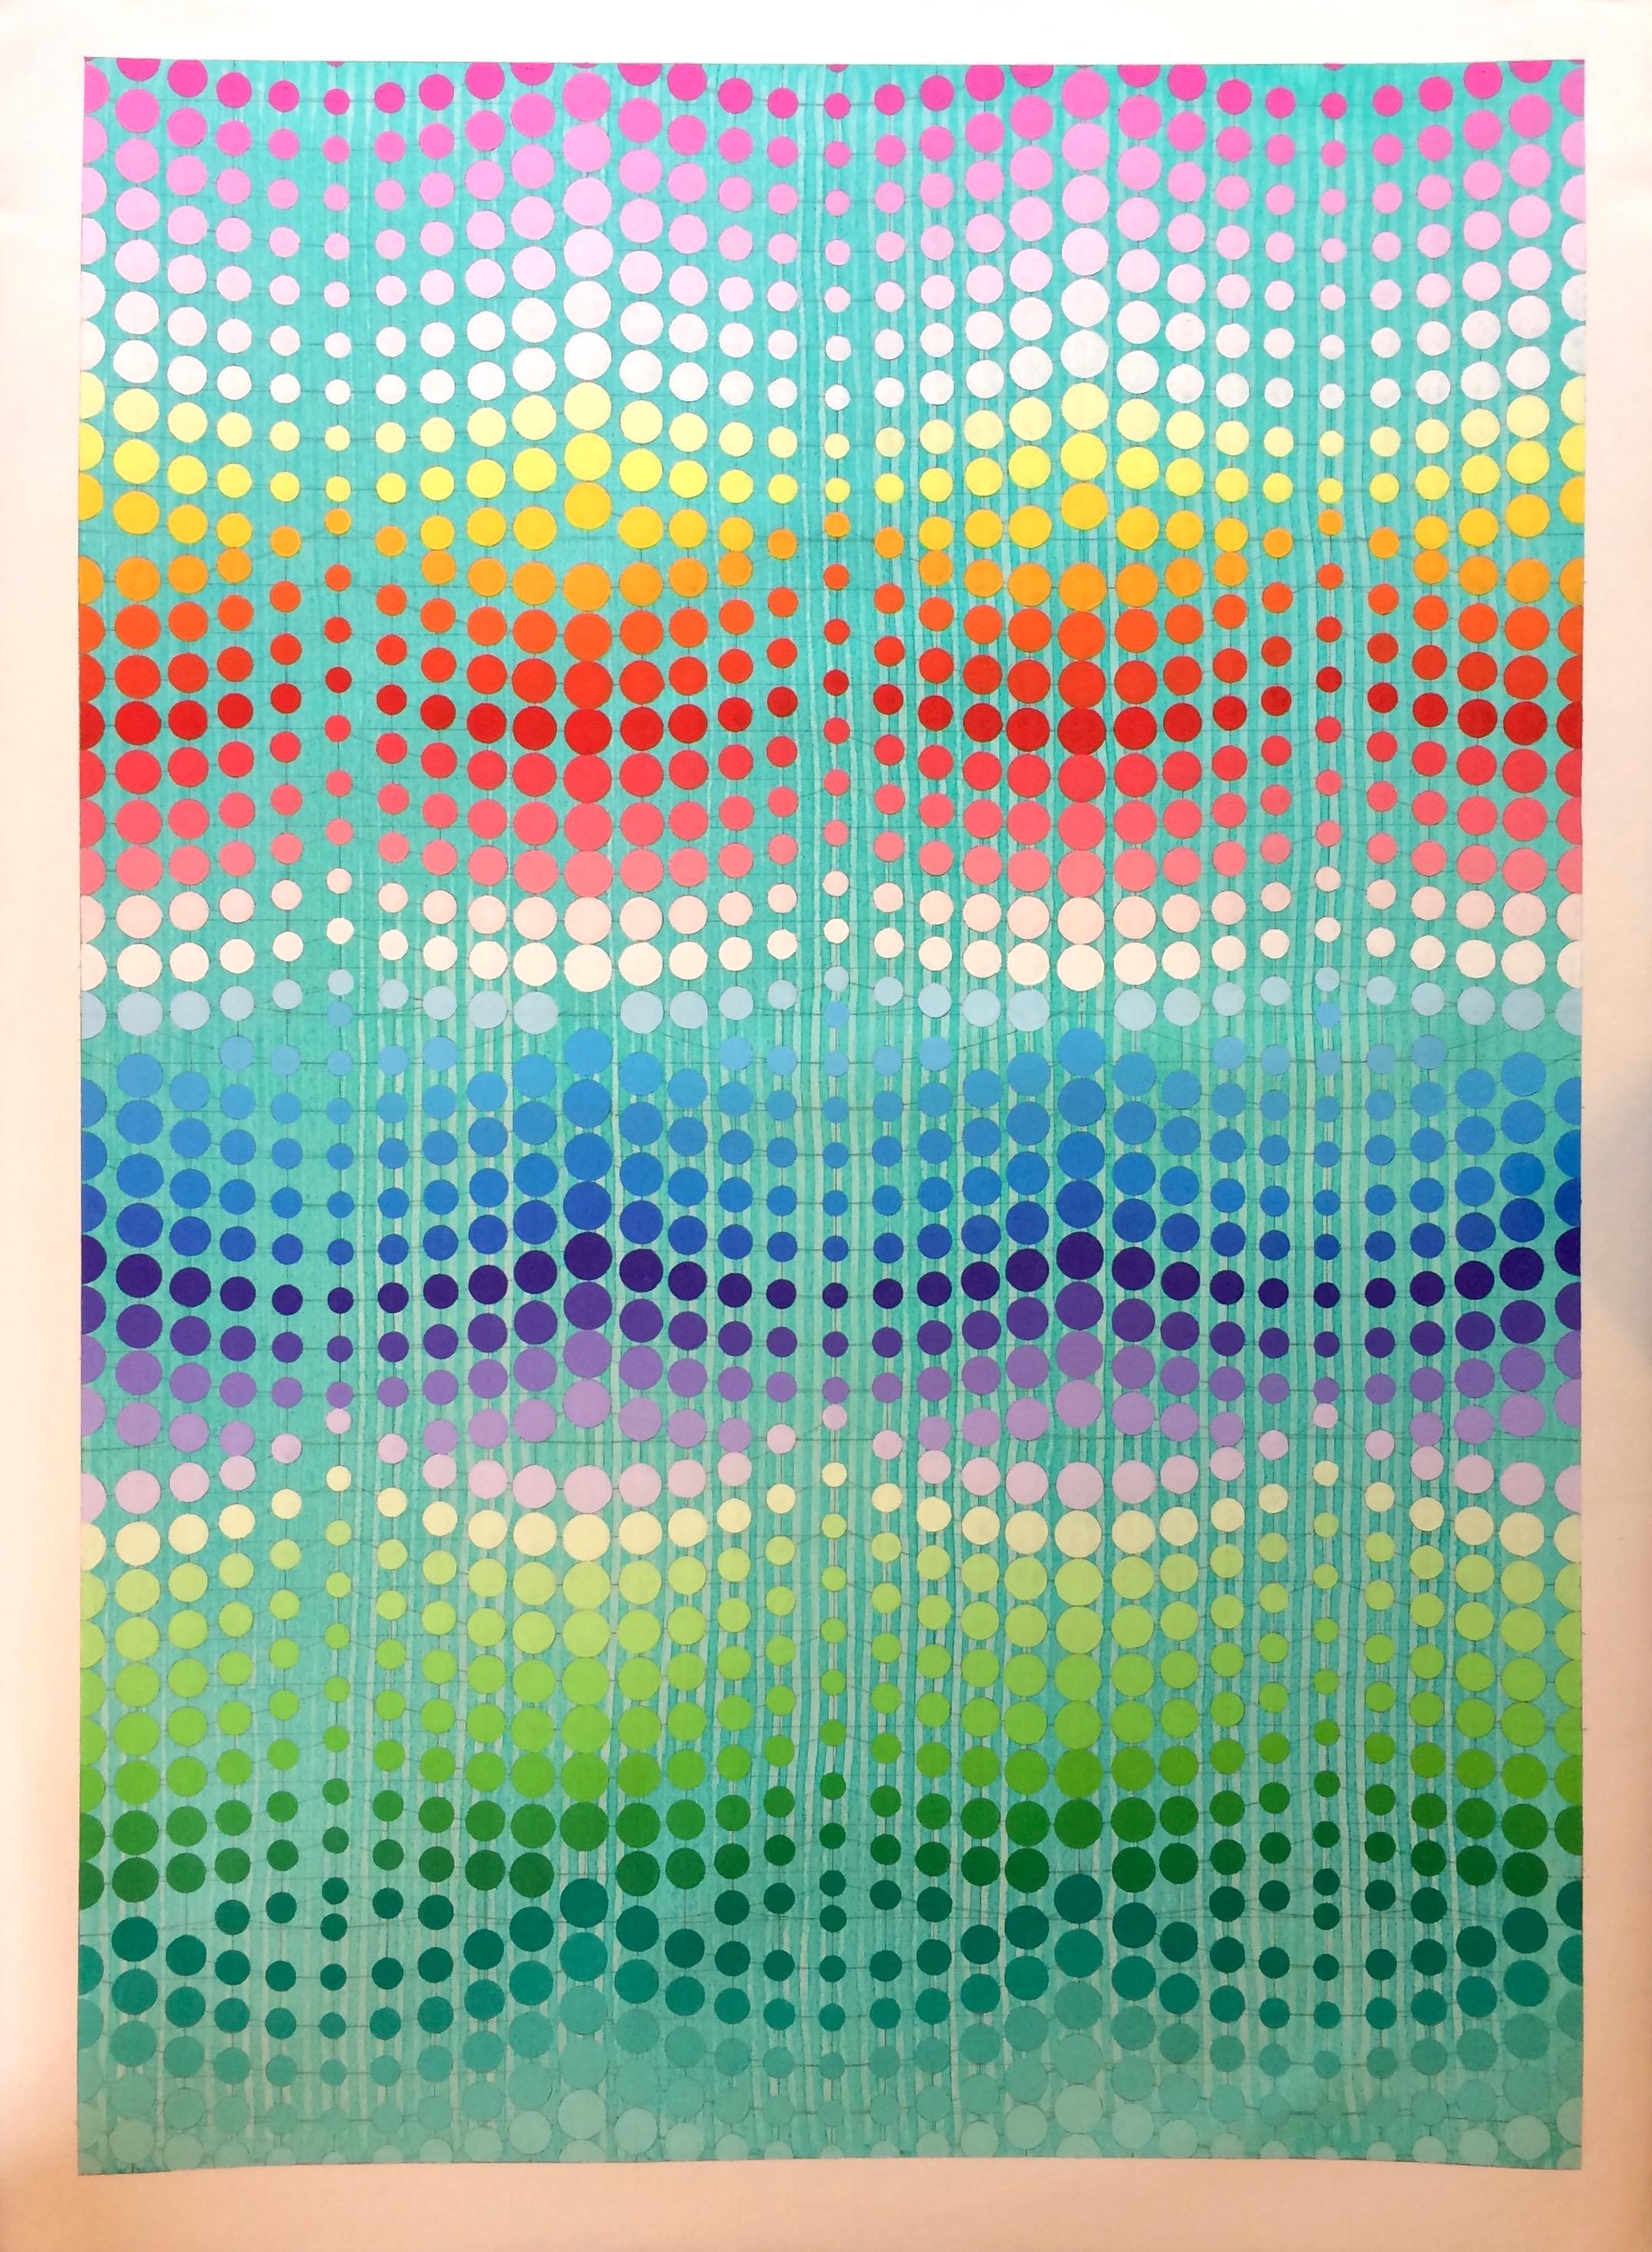 Ditch Plains, 2016, oil on unstretched canvas, 3 x 4 ft, $3,000